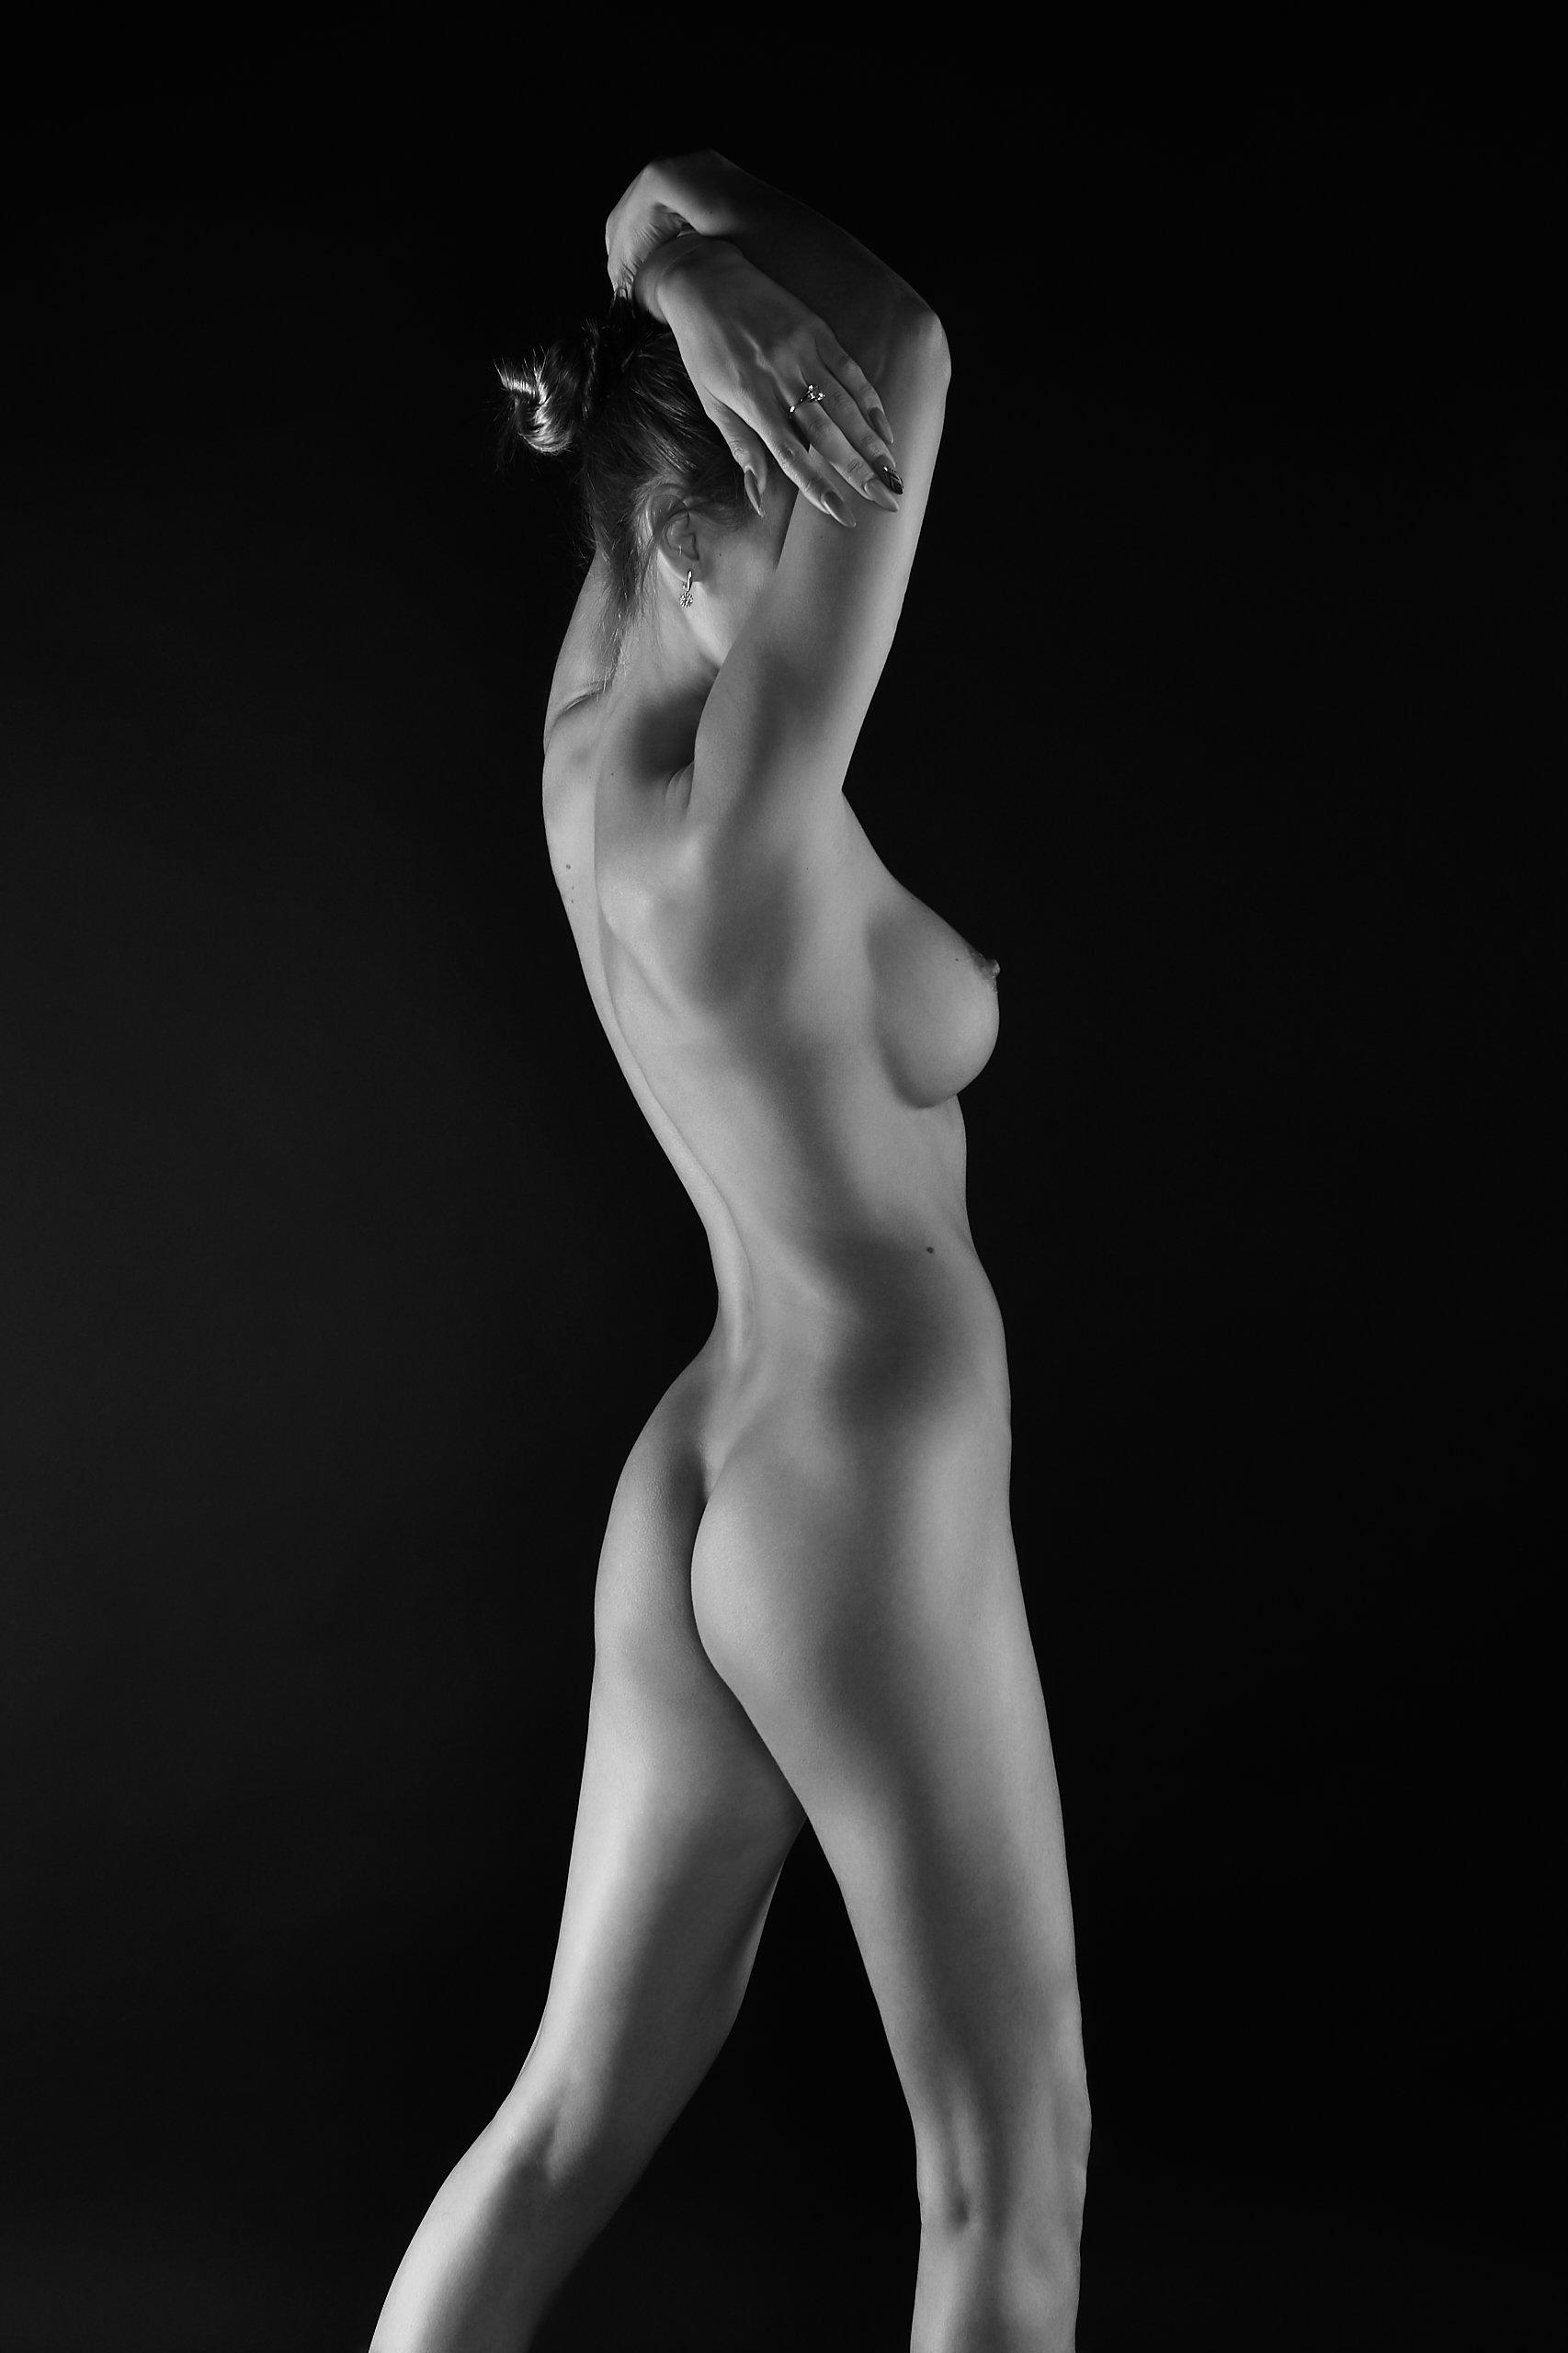 nude, ню, монохром, чб, чернобелое, naked, spotlight, nu, model, girl, dark art, Александр Брент